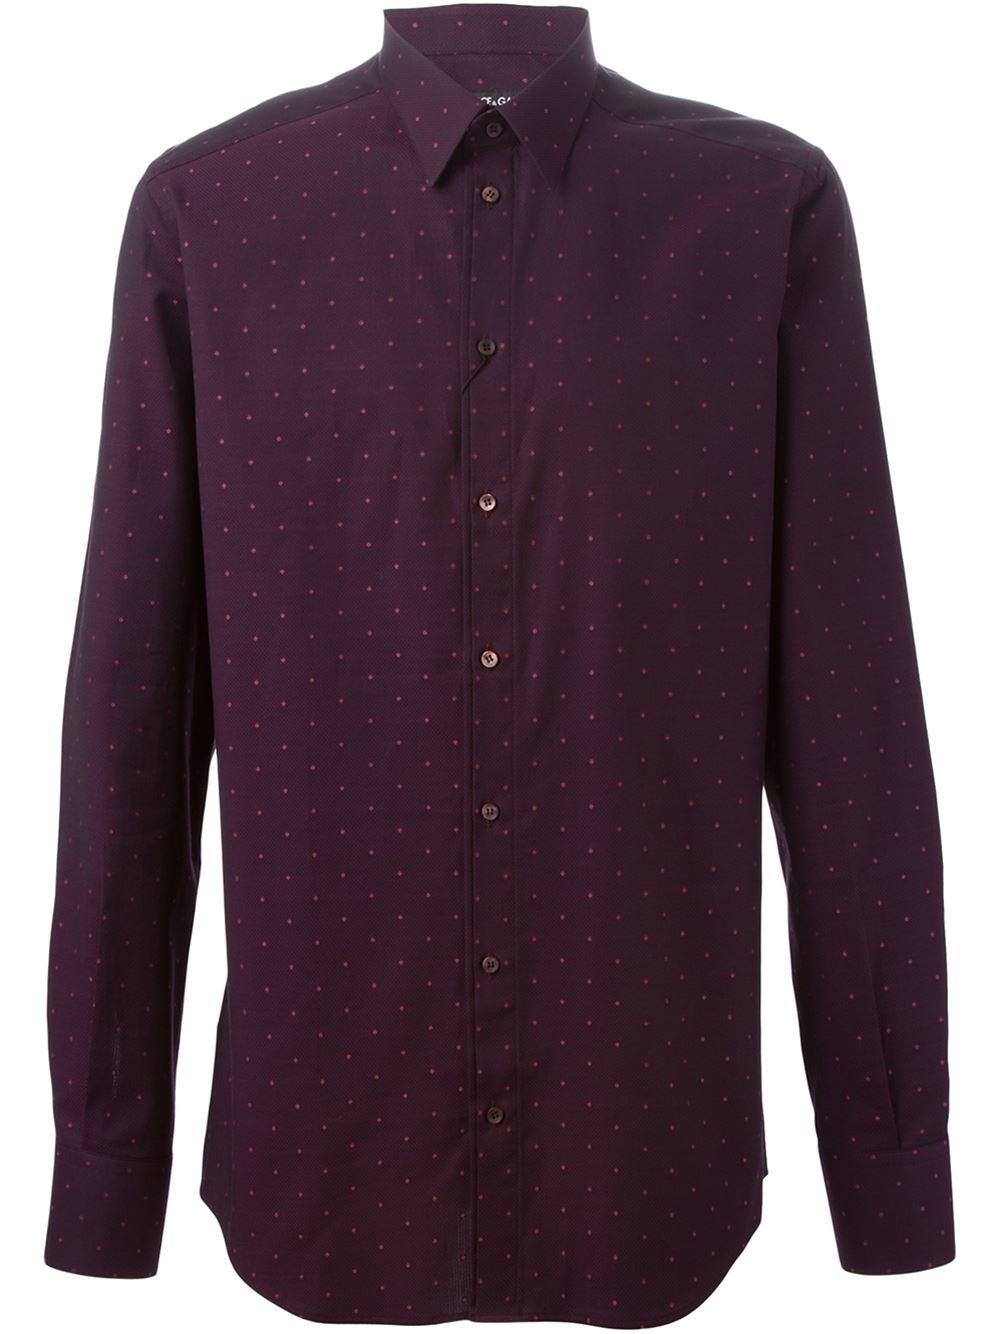 Dolce Gabbana Mini Embroidered Detail Shirt In Purple